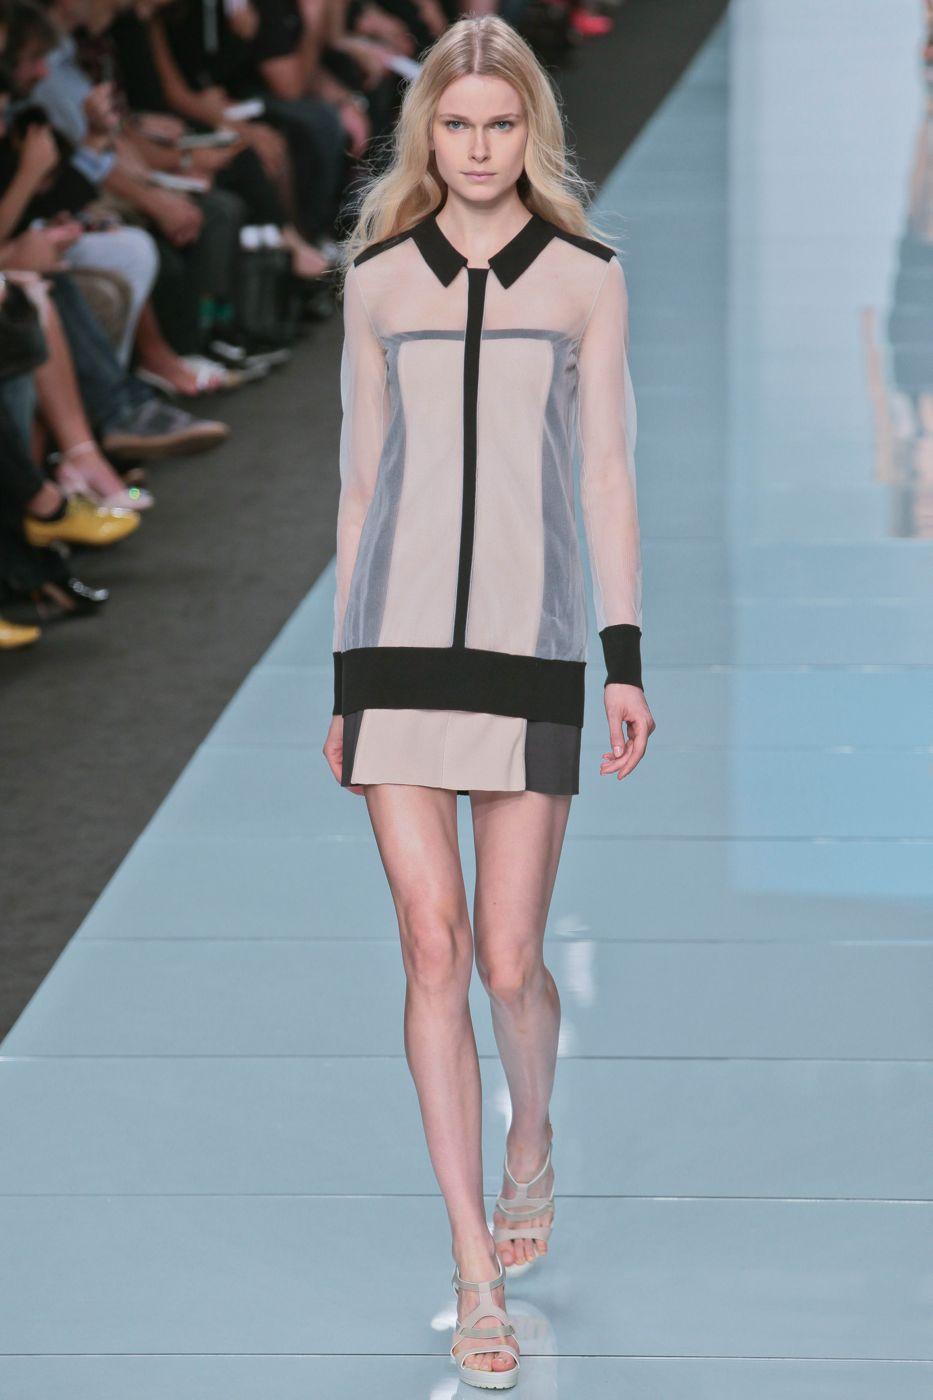 Anteprima S/S 2012 - Milano Fashion Week